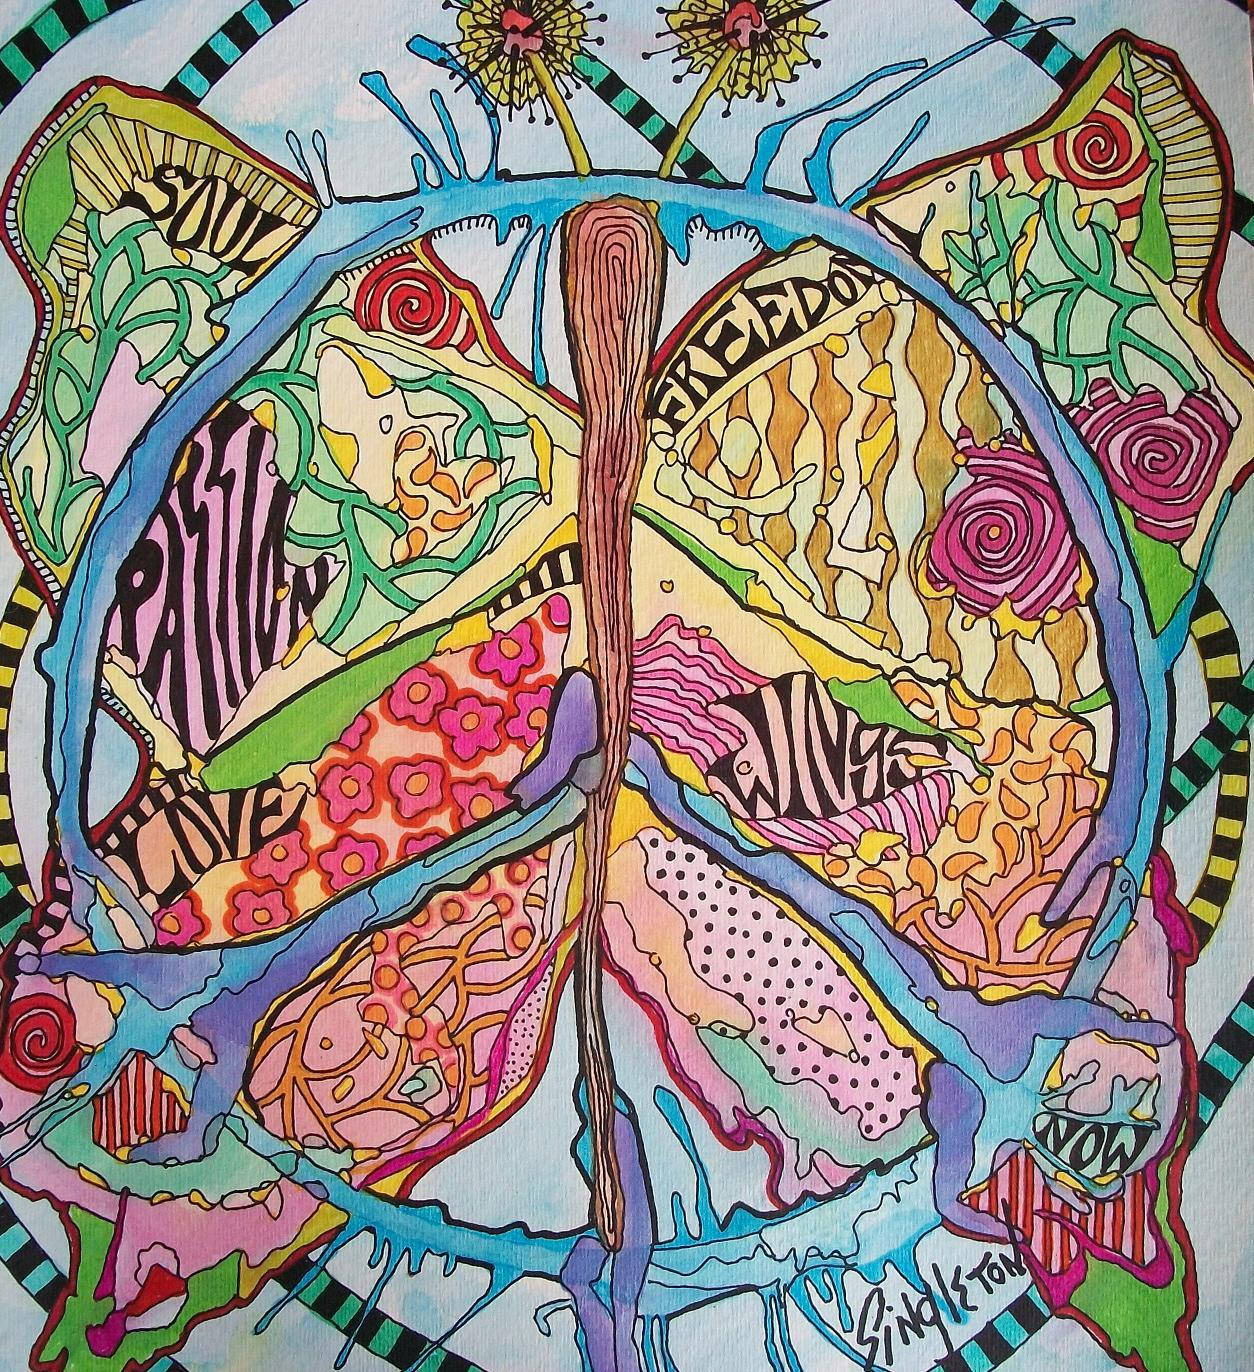 hippie art wallpaper one more time hippie art